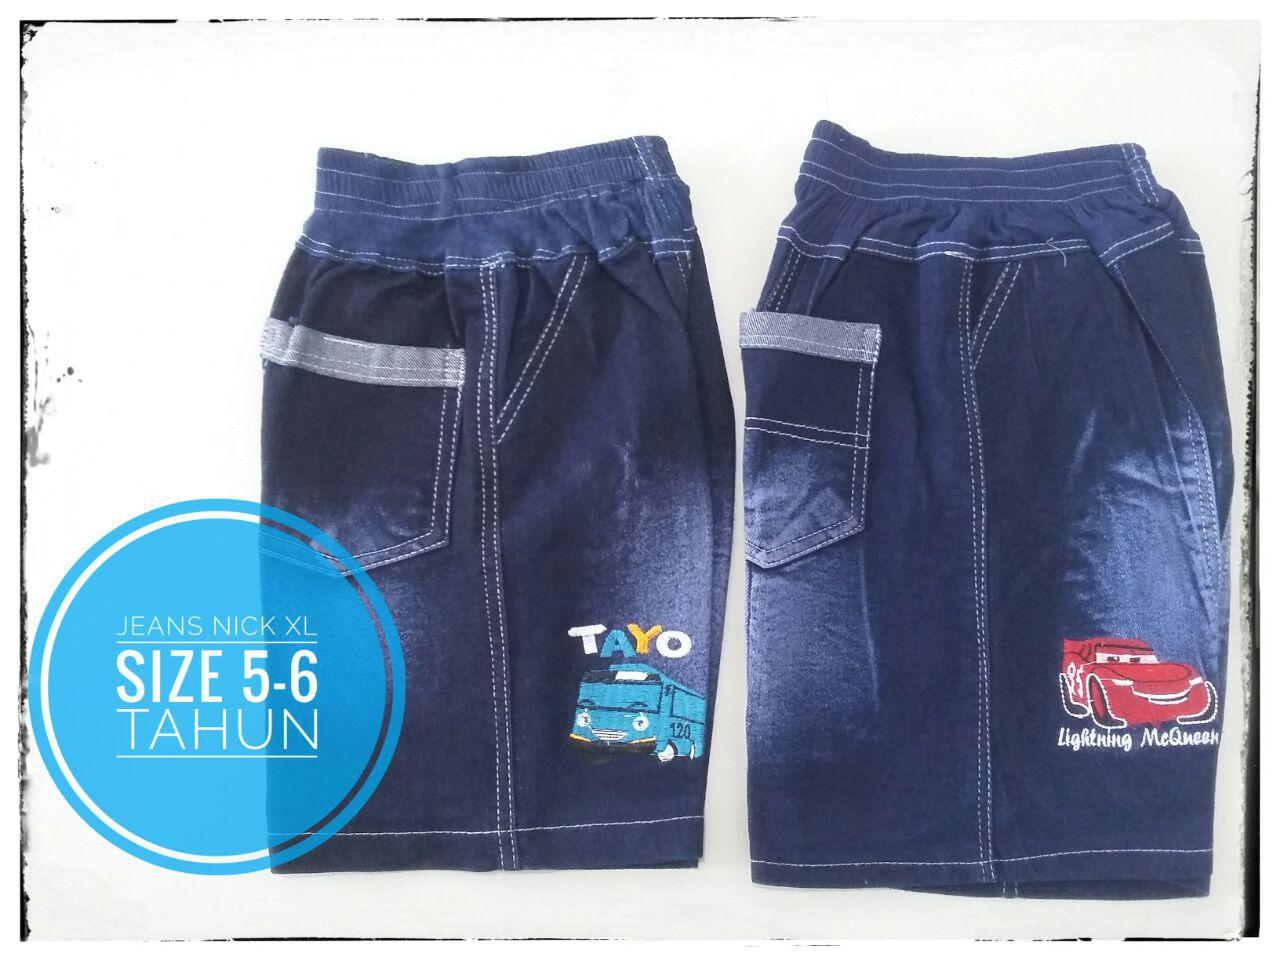 ObralanBaju.com Obral Baju Pakaian Murah Meriah 5000 Celana Kulot Waffle Crep